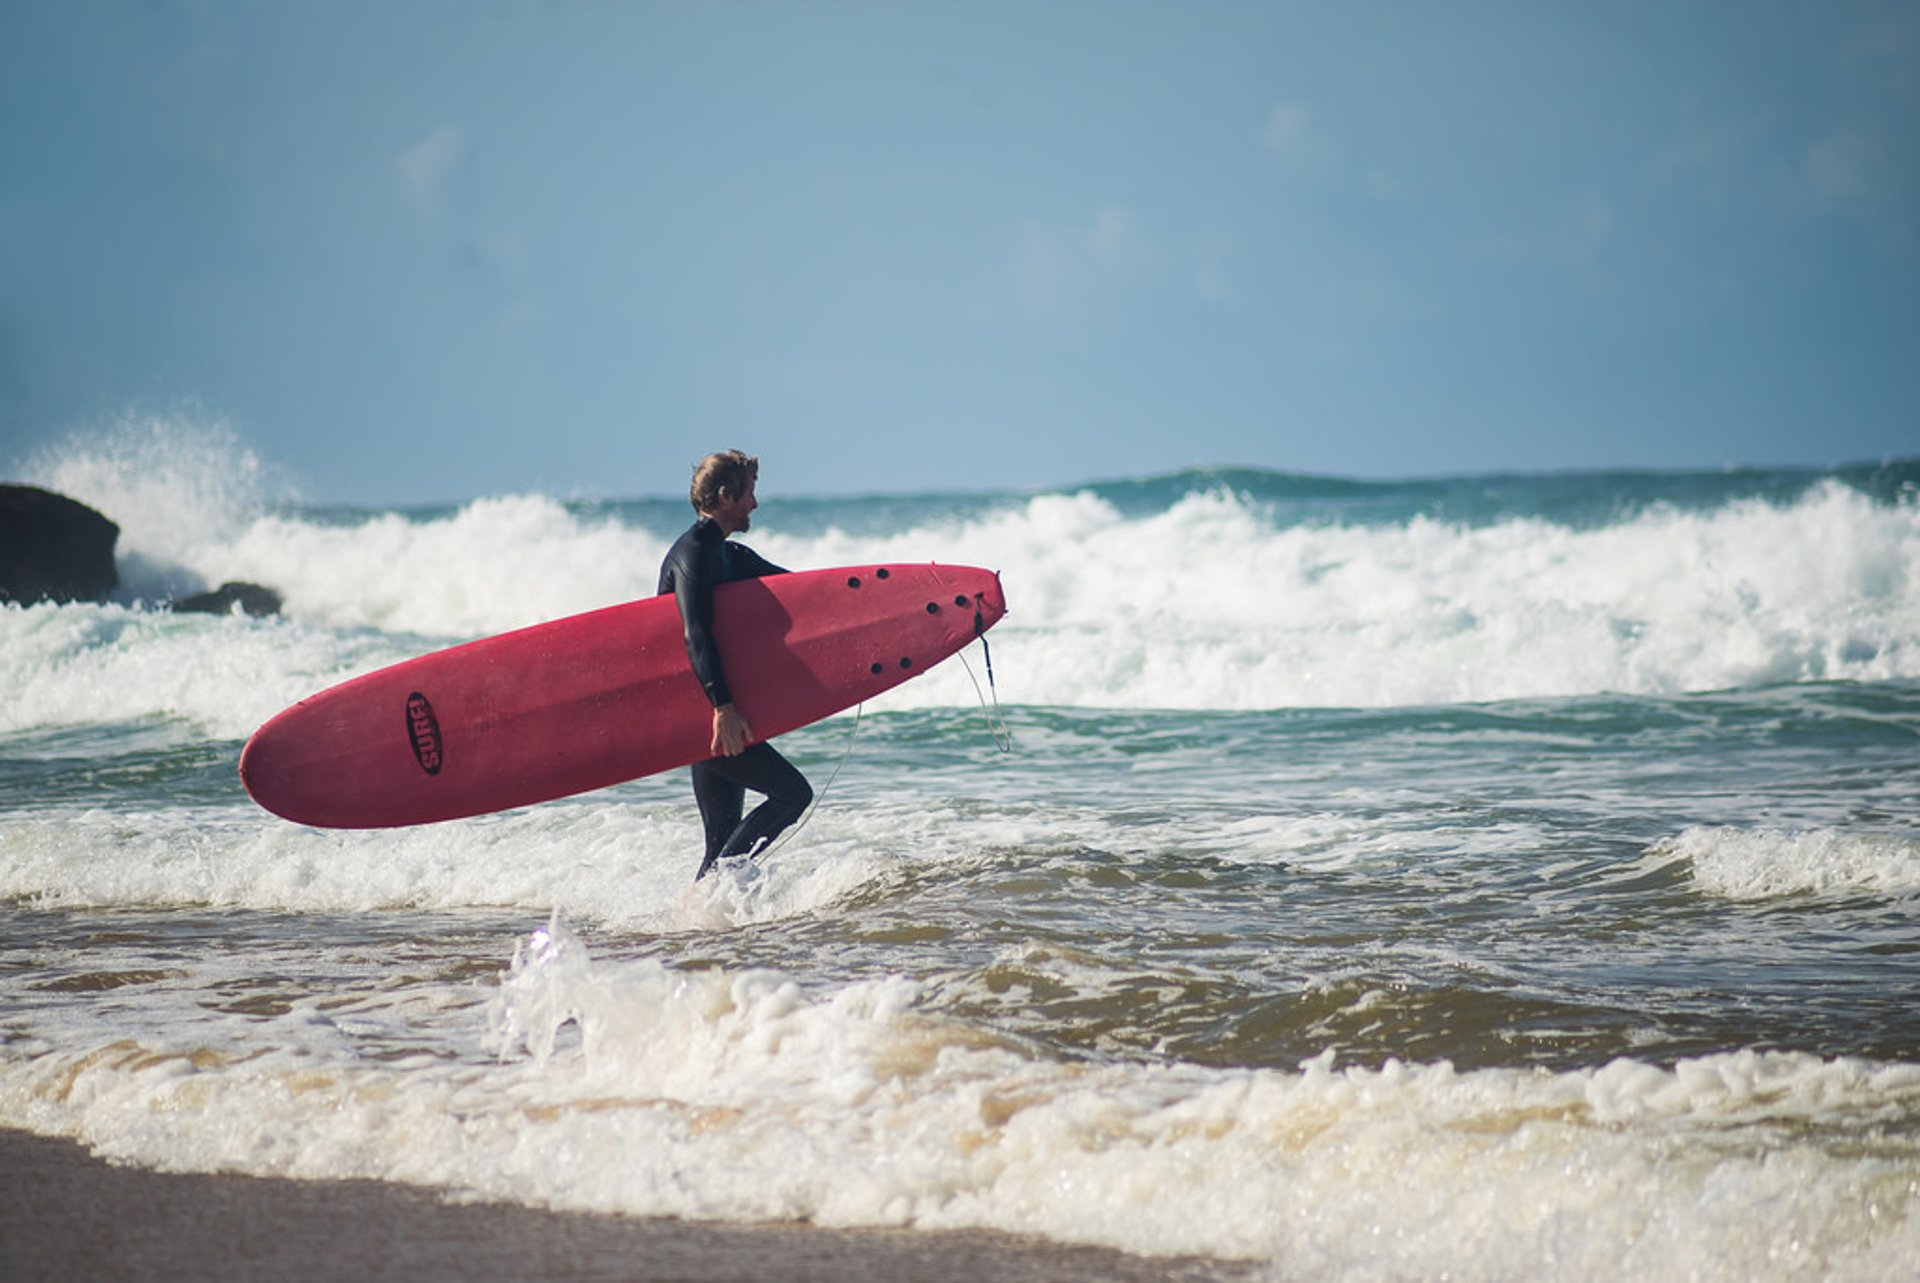 Surfing in Lisbon 2020 - Best Time